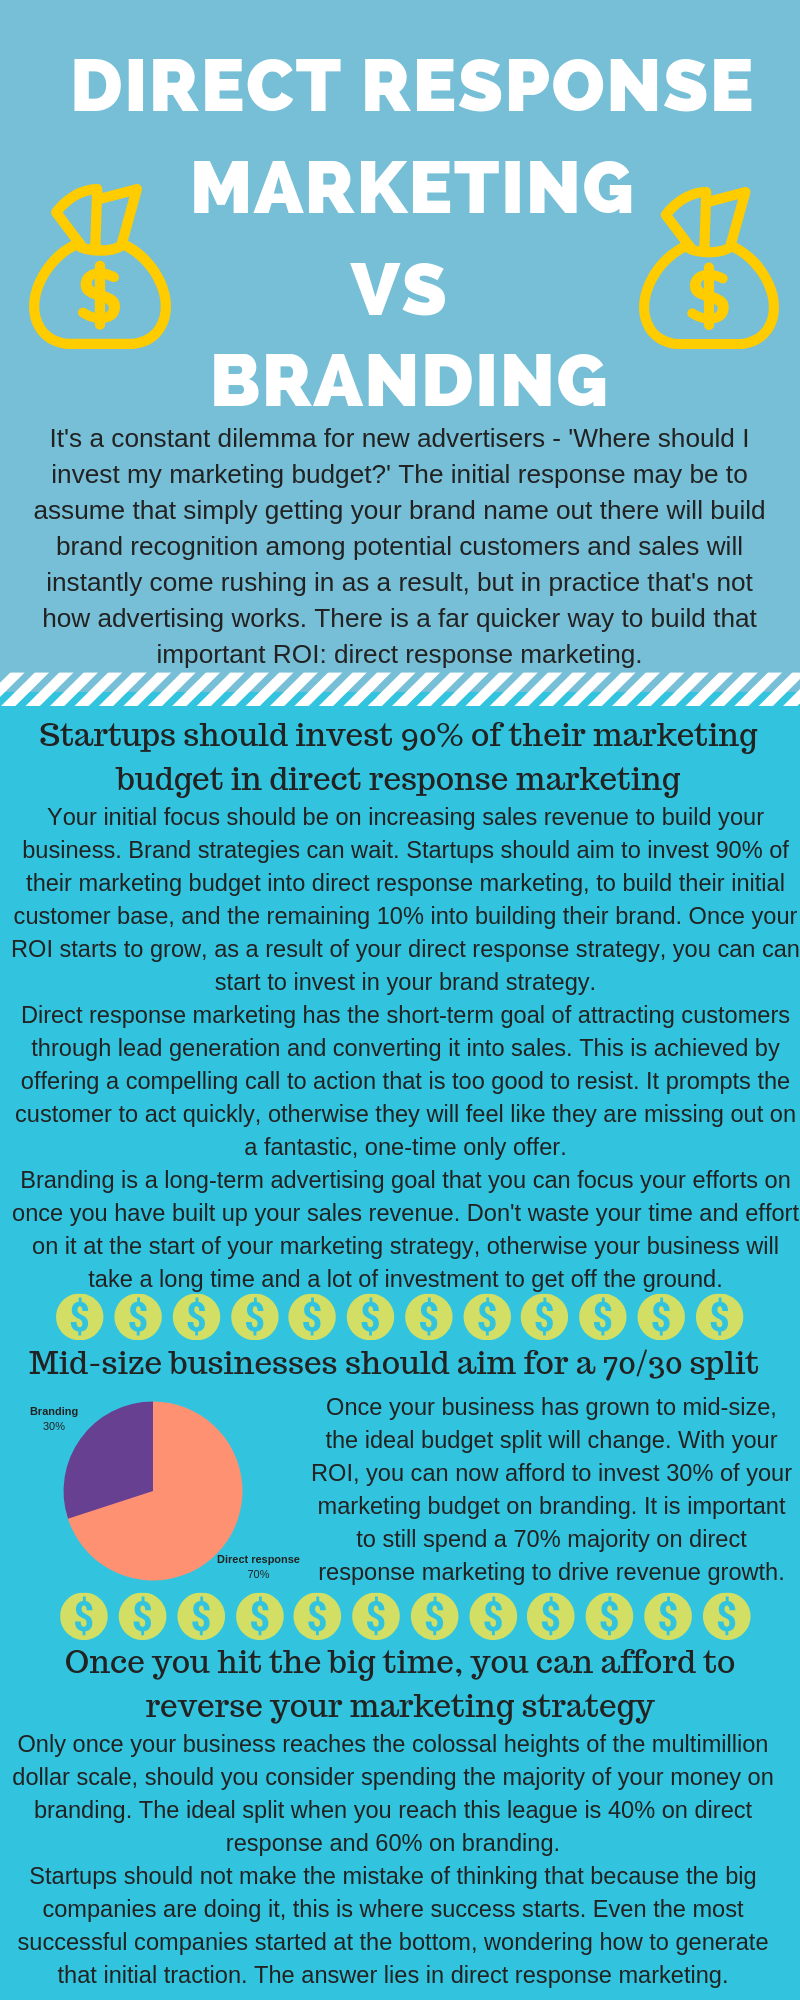 Direct Response Marketing vs Branding (1)